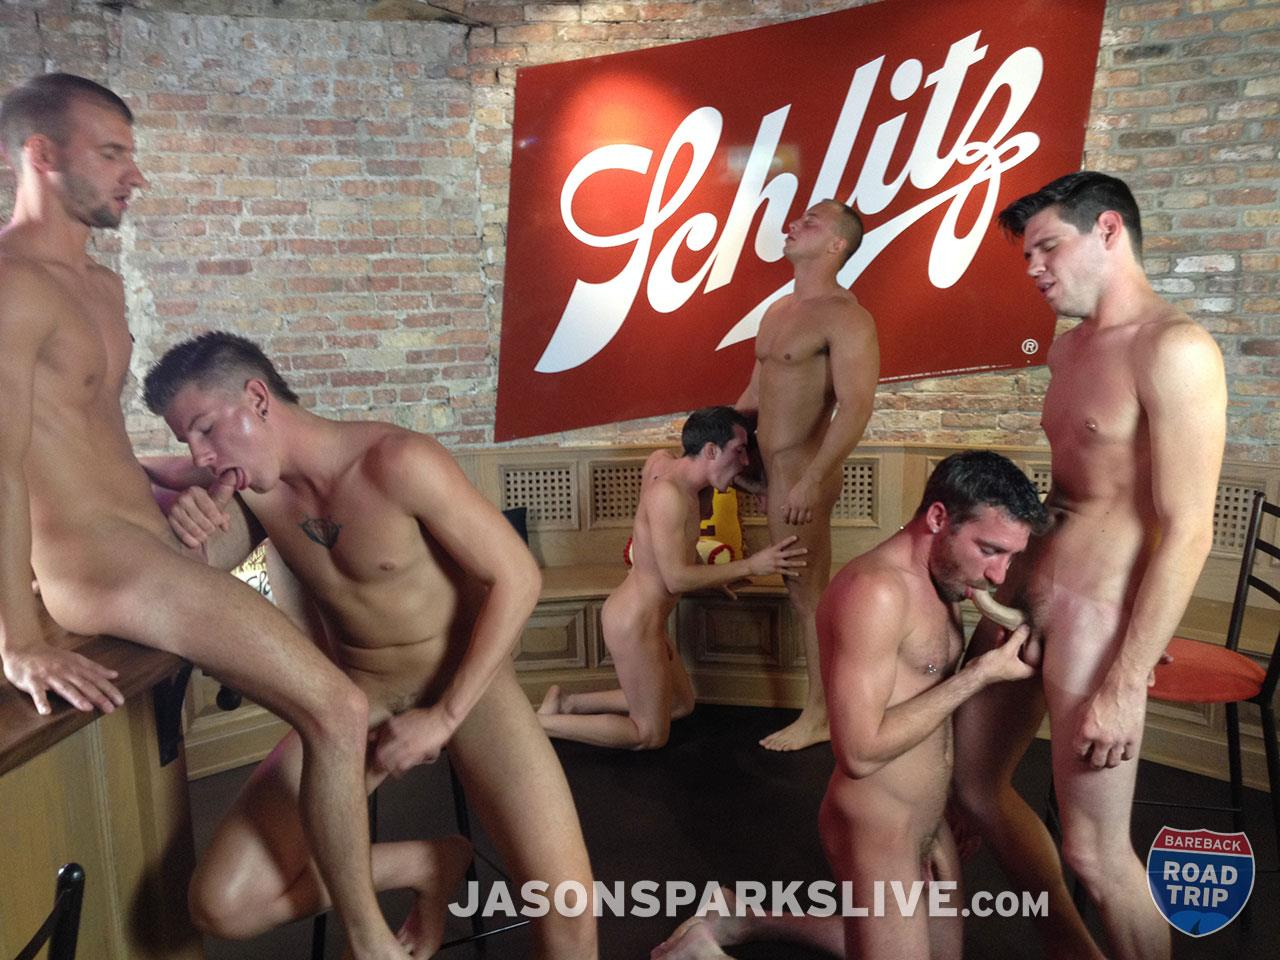 Jason-Sparks-Live-Dustin-Tyler-Shawn-Andrews-Brendon-Scott-Corbin-Riley-Antonio-Paul-Jake-Matthews-Bareback-Orgy-Amateur-Gay-Porn-06 Big Cock Amateur Bareback Orgy in Milwaukee